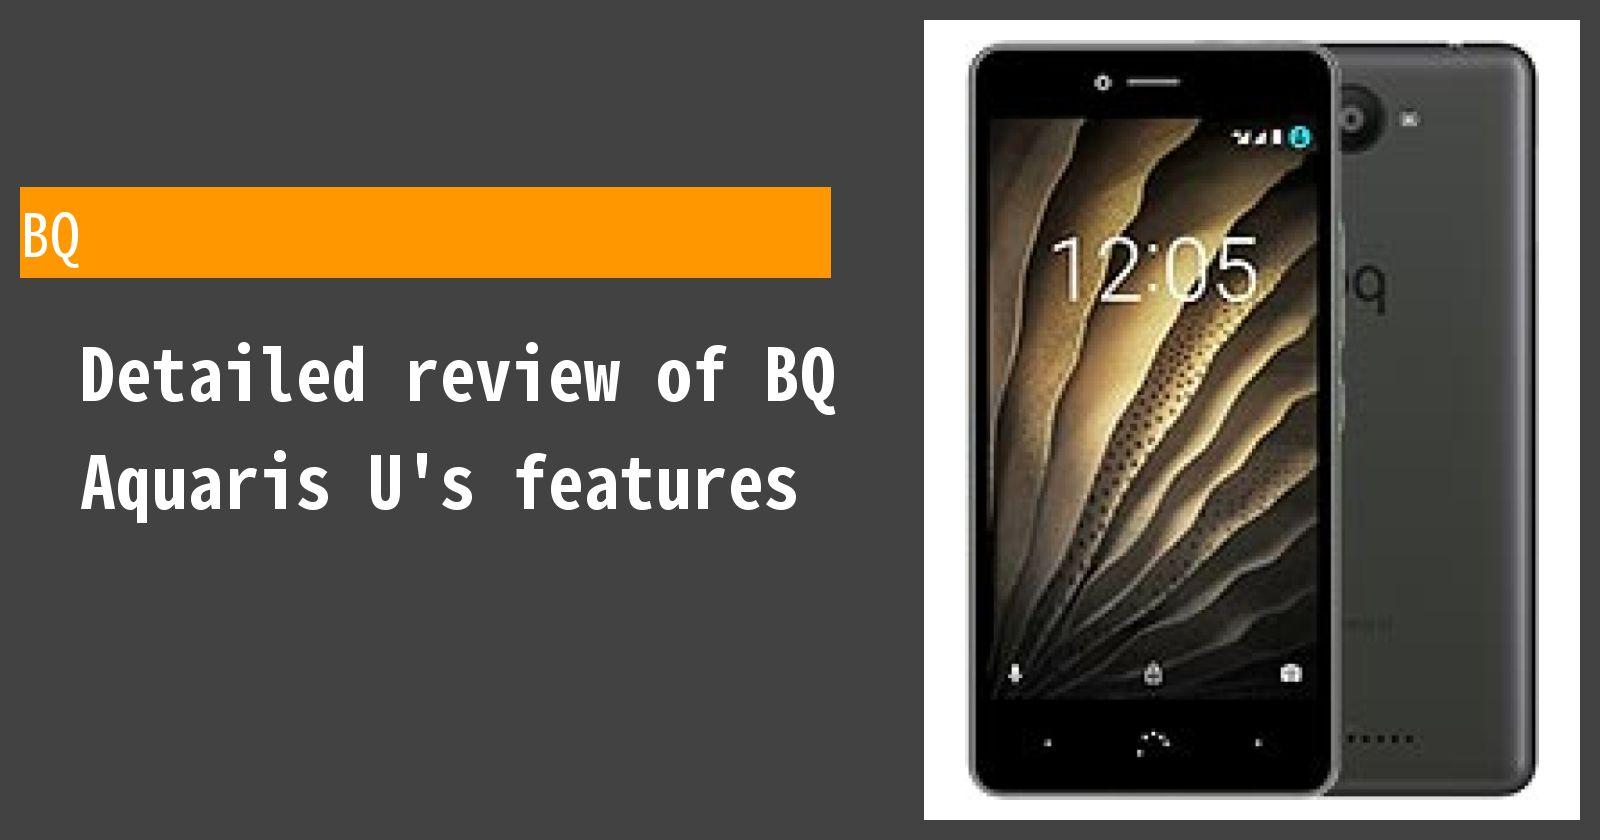 Detailed review of BQ Aquaris U's features